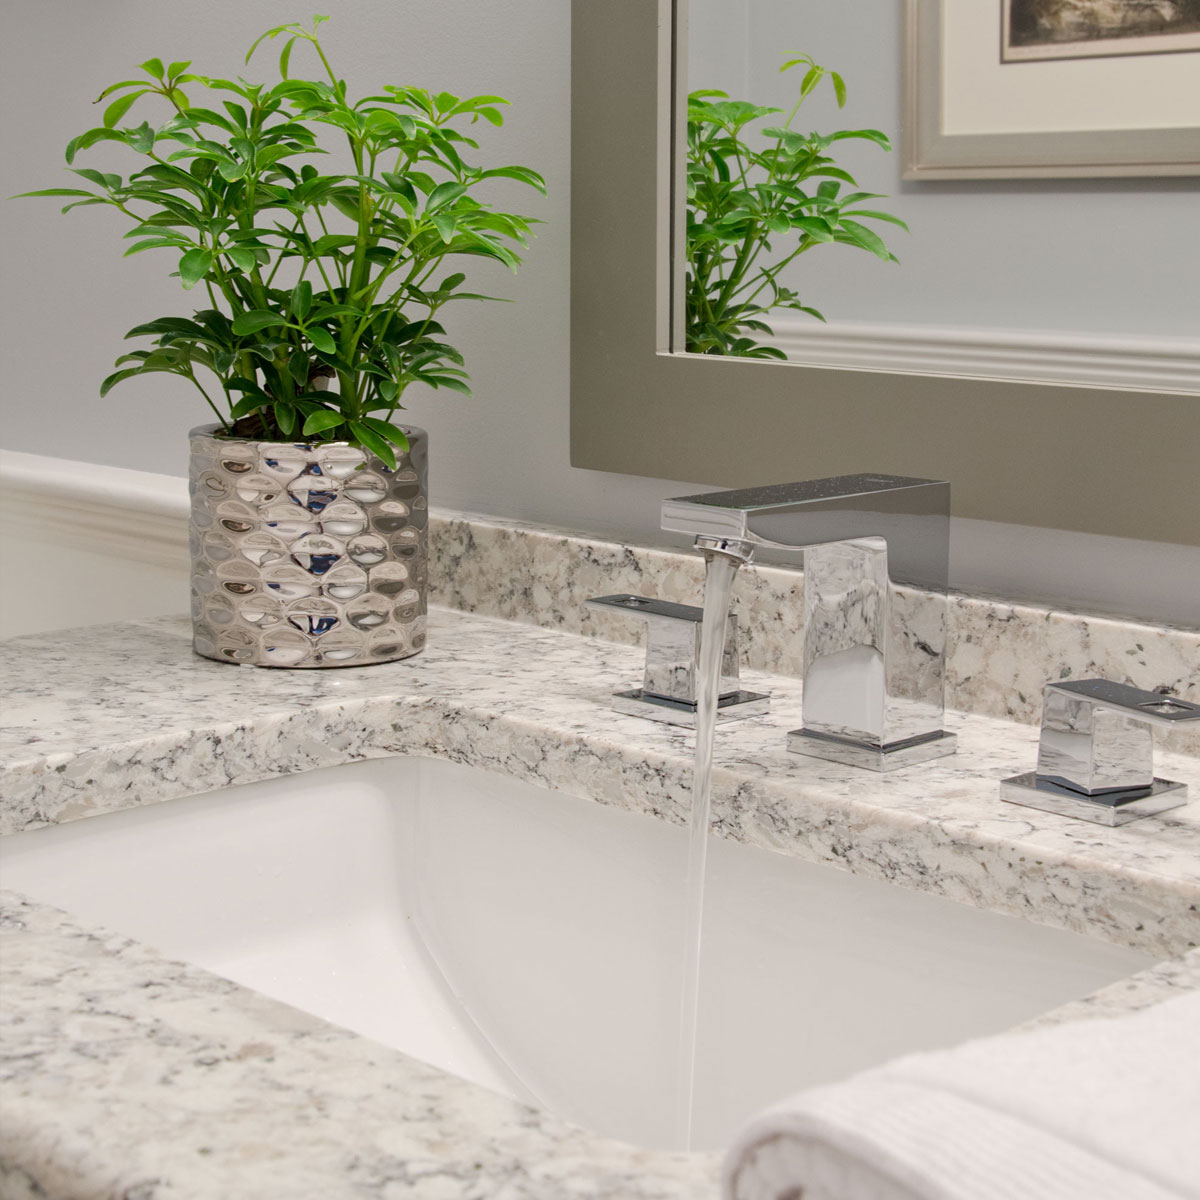 Bathroom sink design by Susan Curtis Interiors